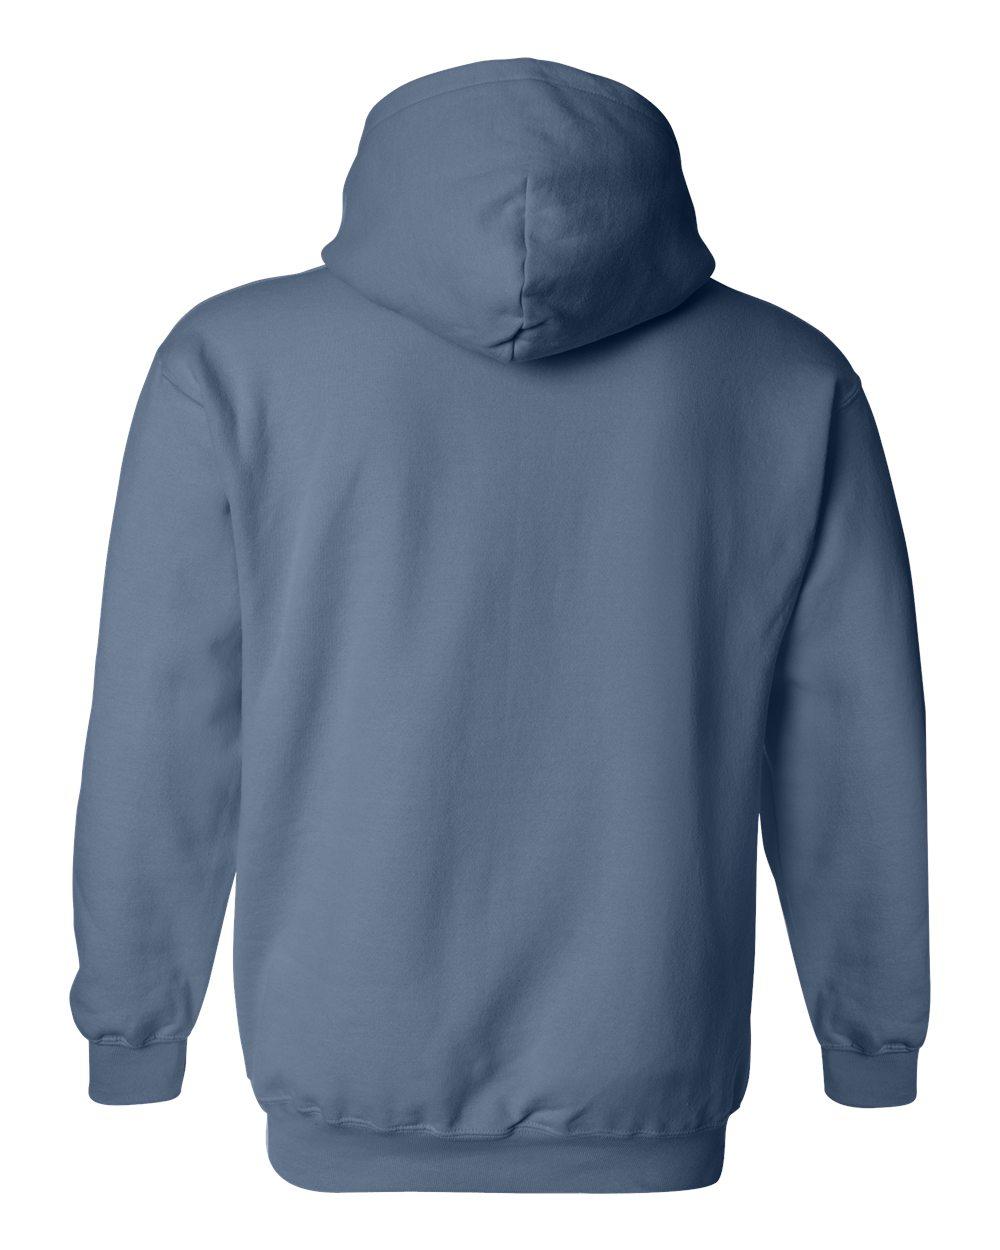 Gildan-Mens-Blank-Hoodie-Heavy-Blend-Hooded-Sweatshirt-Solid-18500-up-to-5XL thumbnail 40